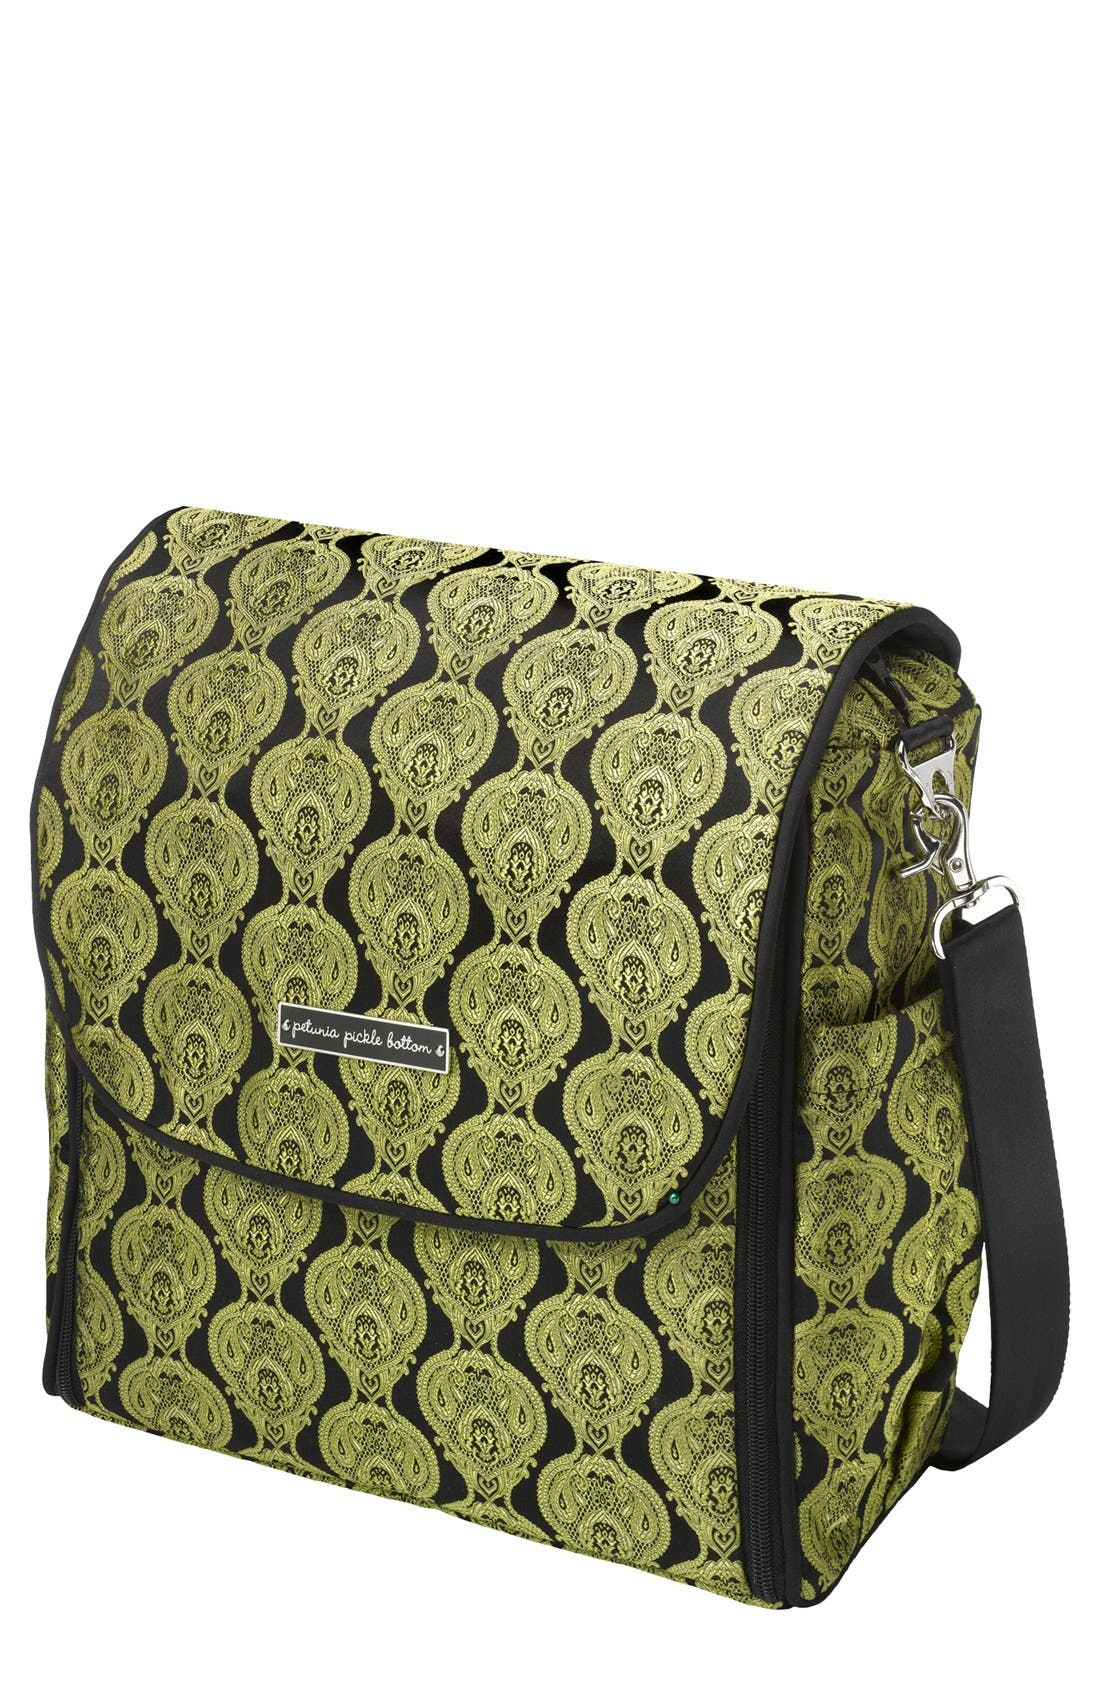 Alternate Image 1 Selected - Petunia Pickle Bottom 'Boxy' Brocade Backpack Diaper Bag